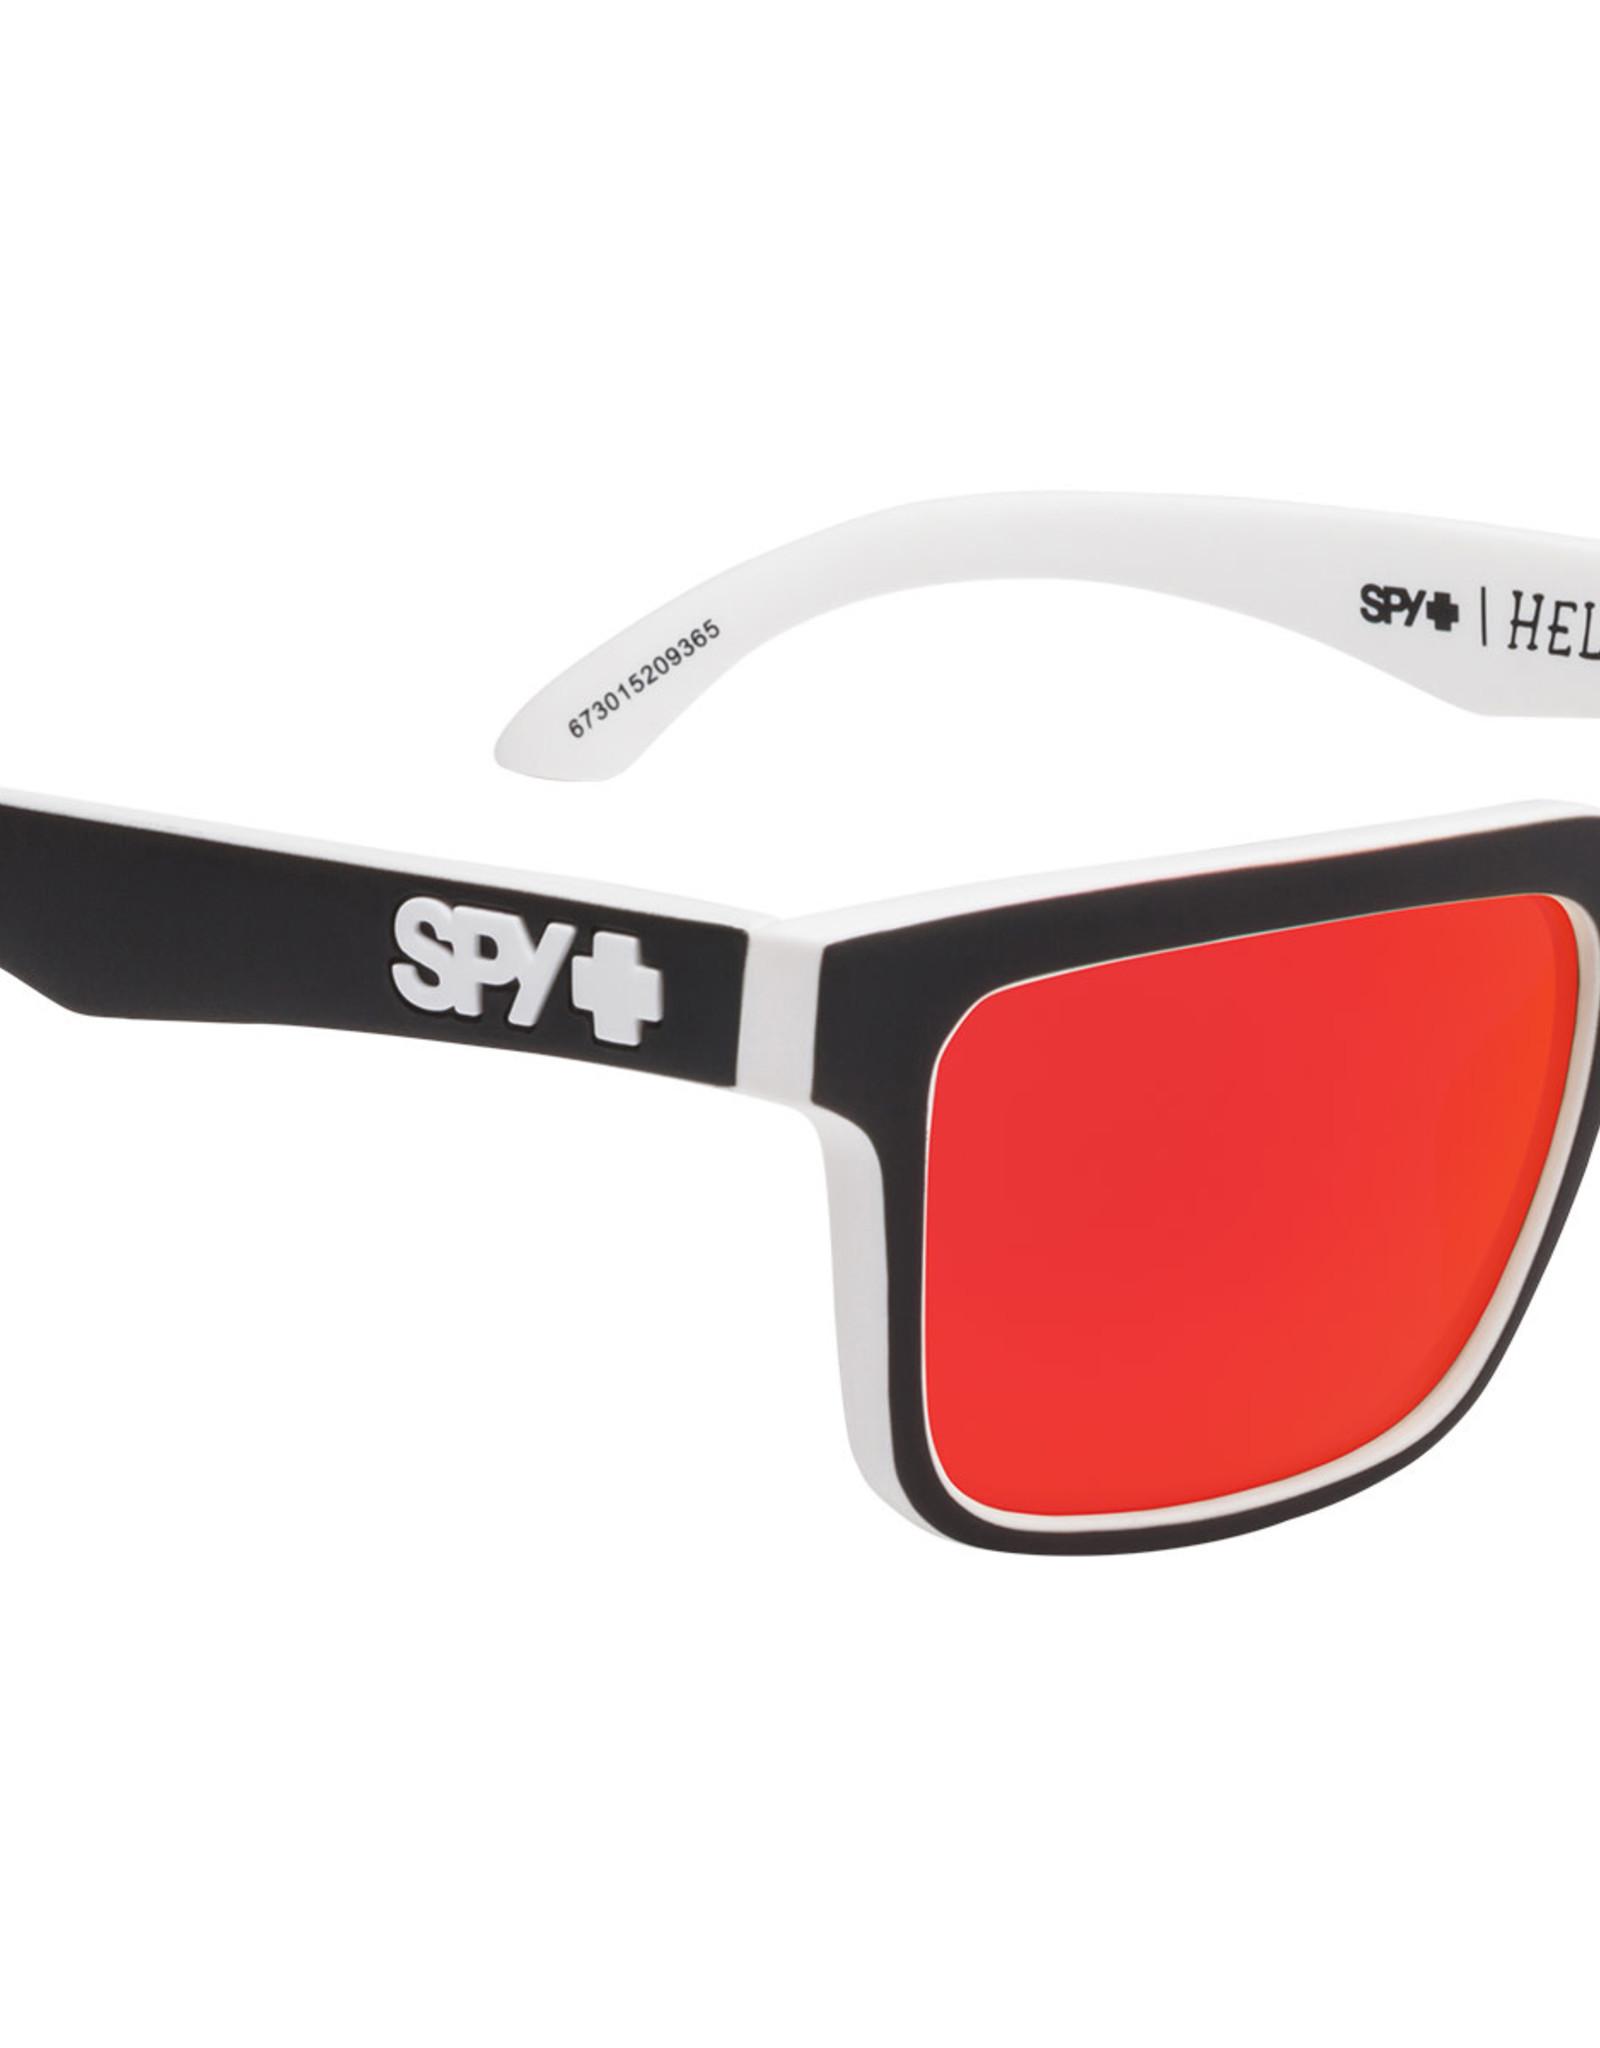 SPY Helm Whitewall HD+ redspectramirror